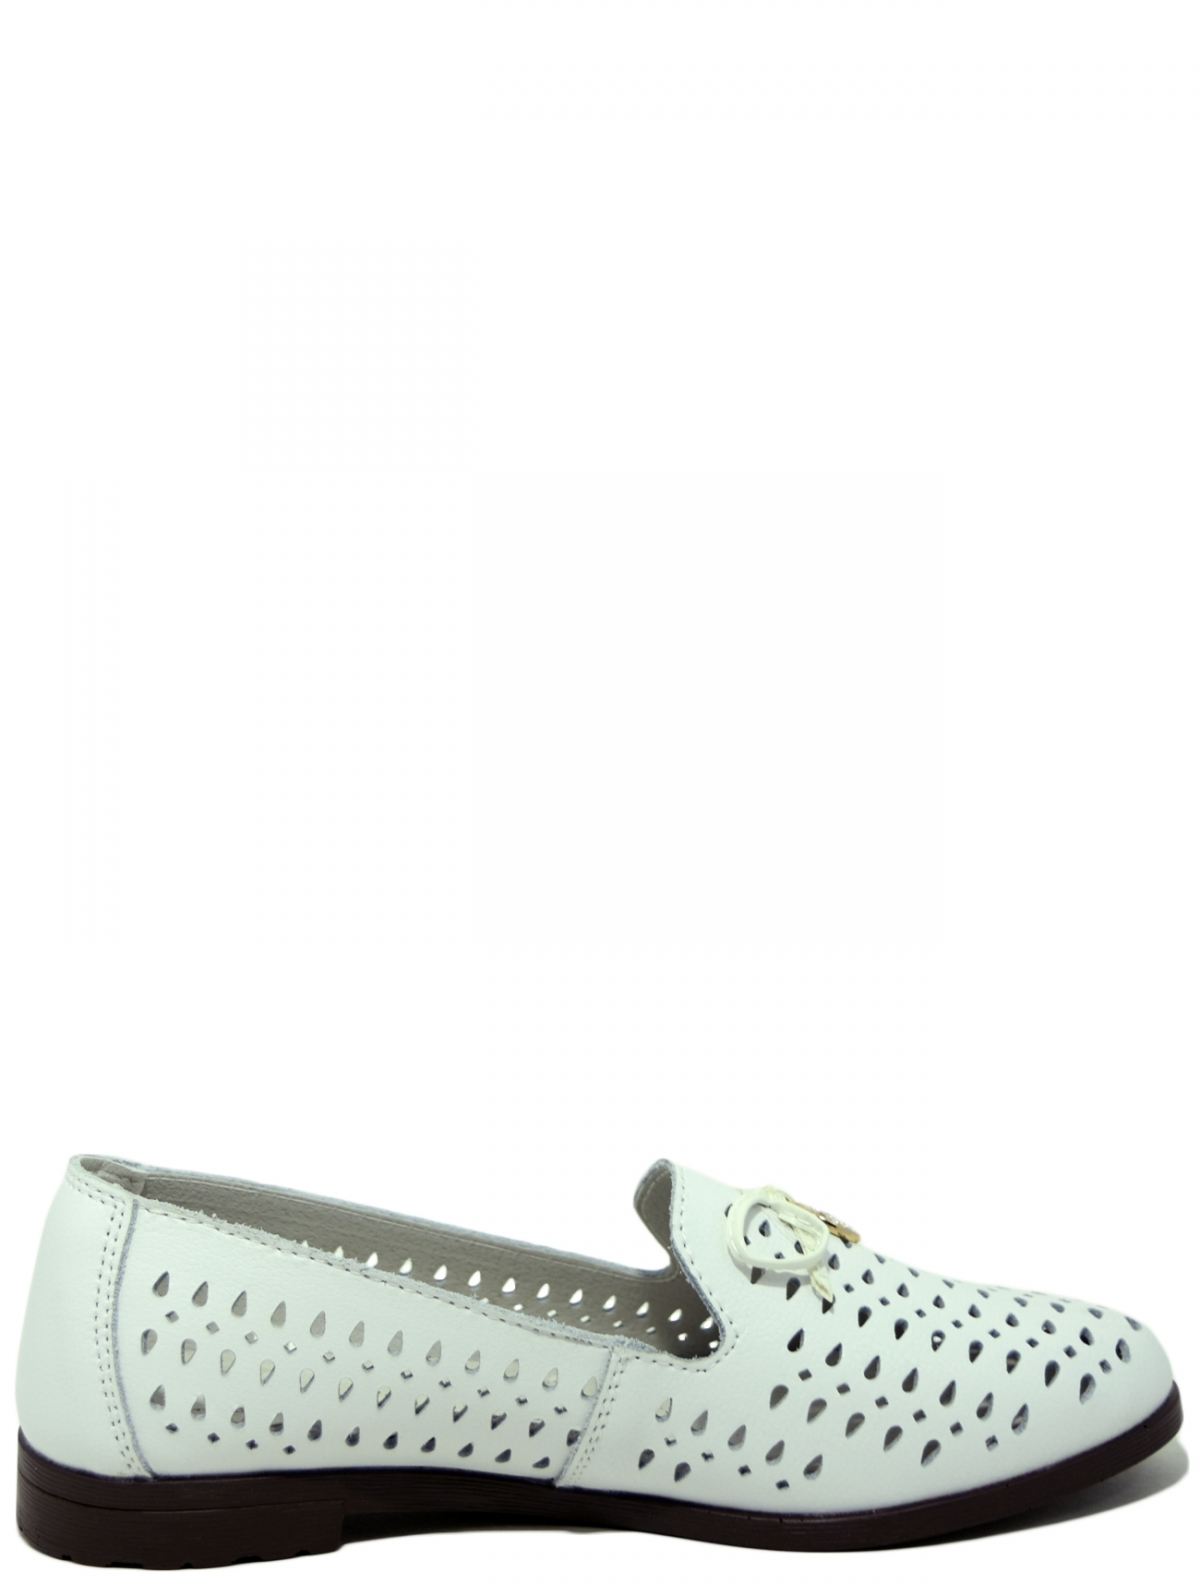 Destra 6330-02-141 женские лоферы